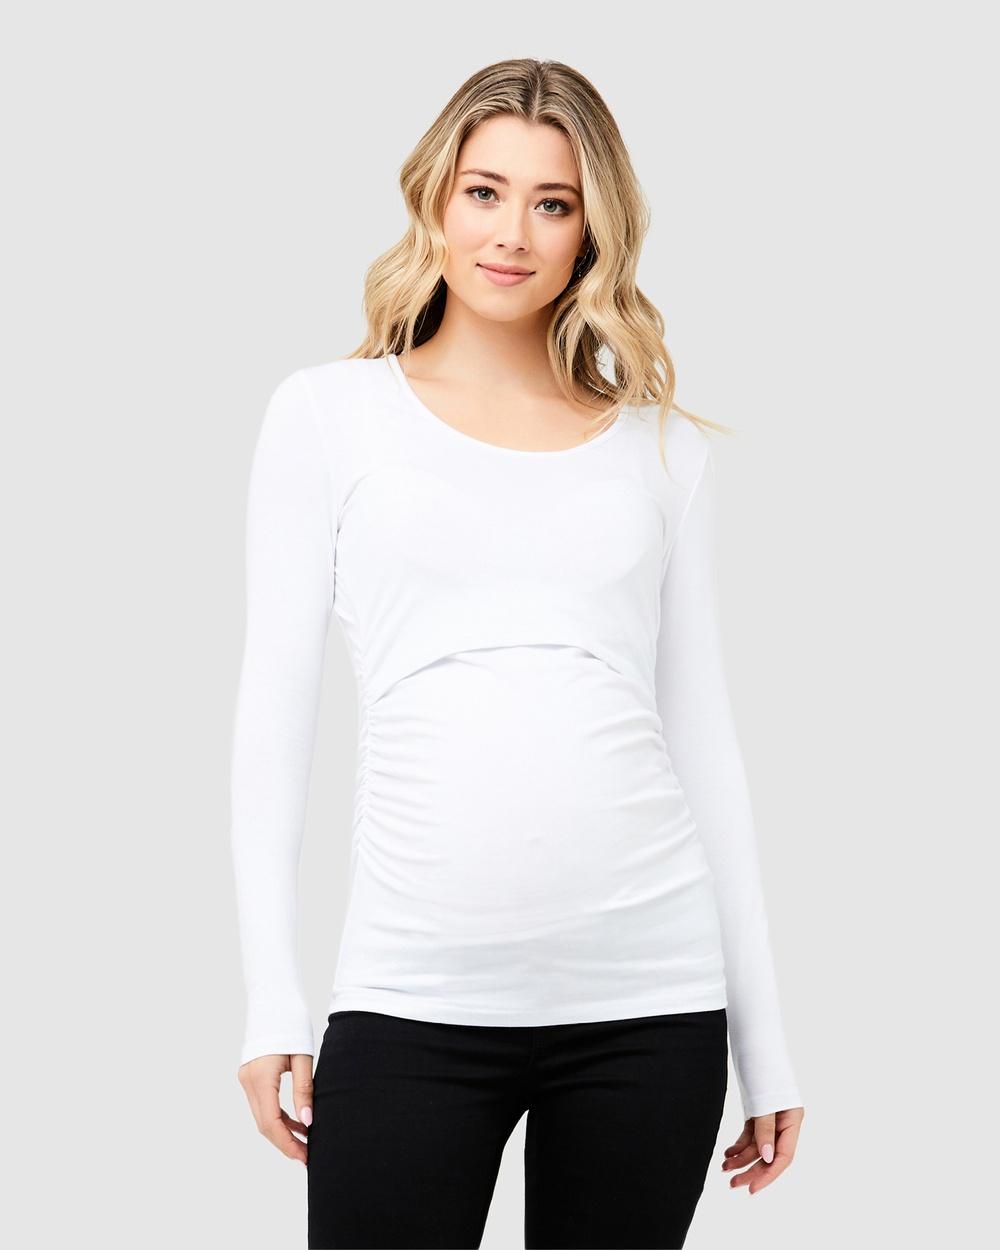 Ripe Maternity Ali Up Down Nursing Long Sleeve Tee Tops White Ali Up-Down Nursing Long Sleeve Tee